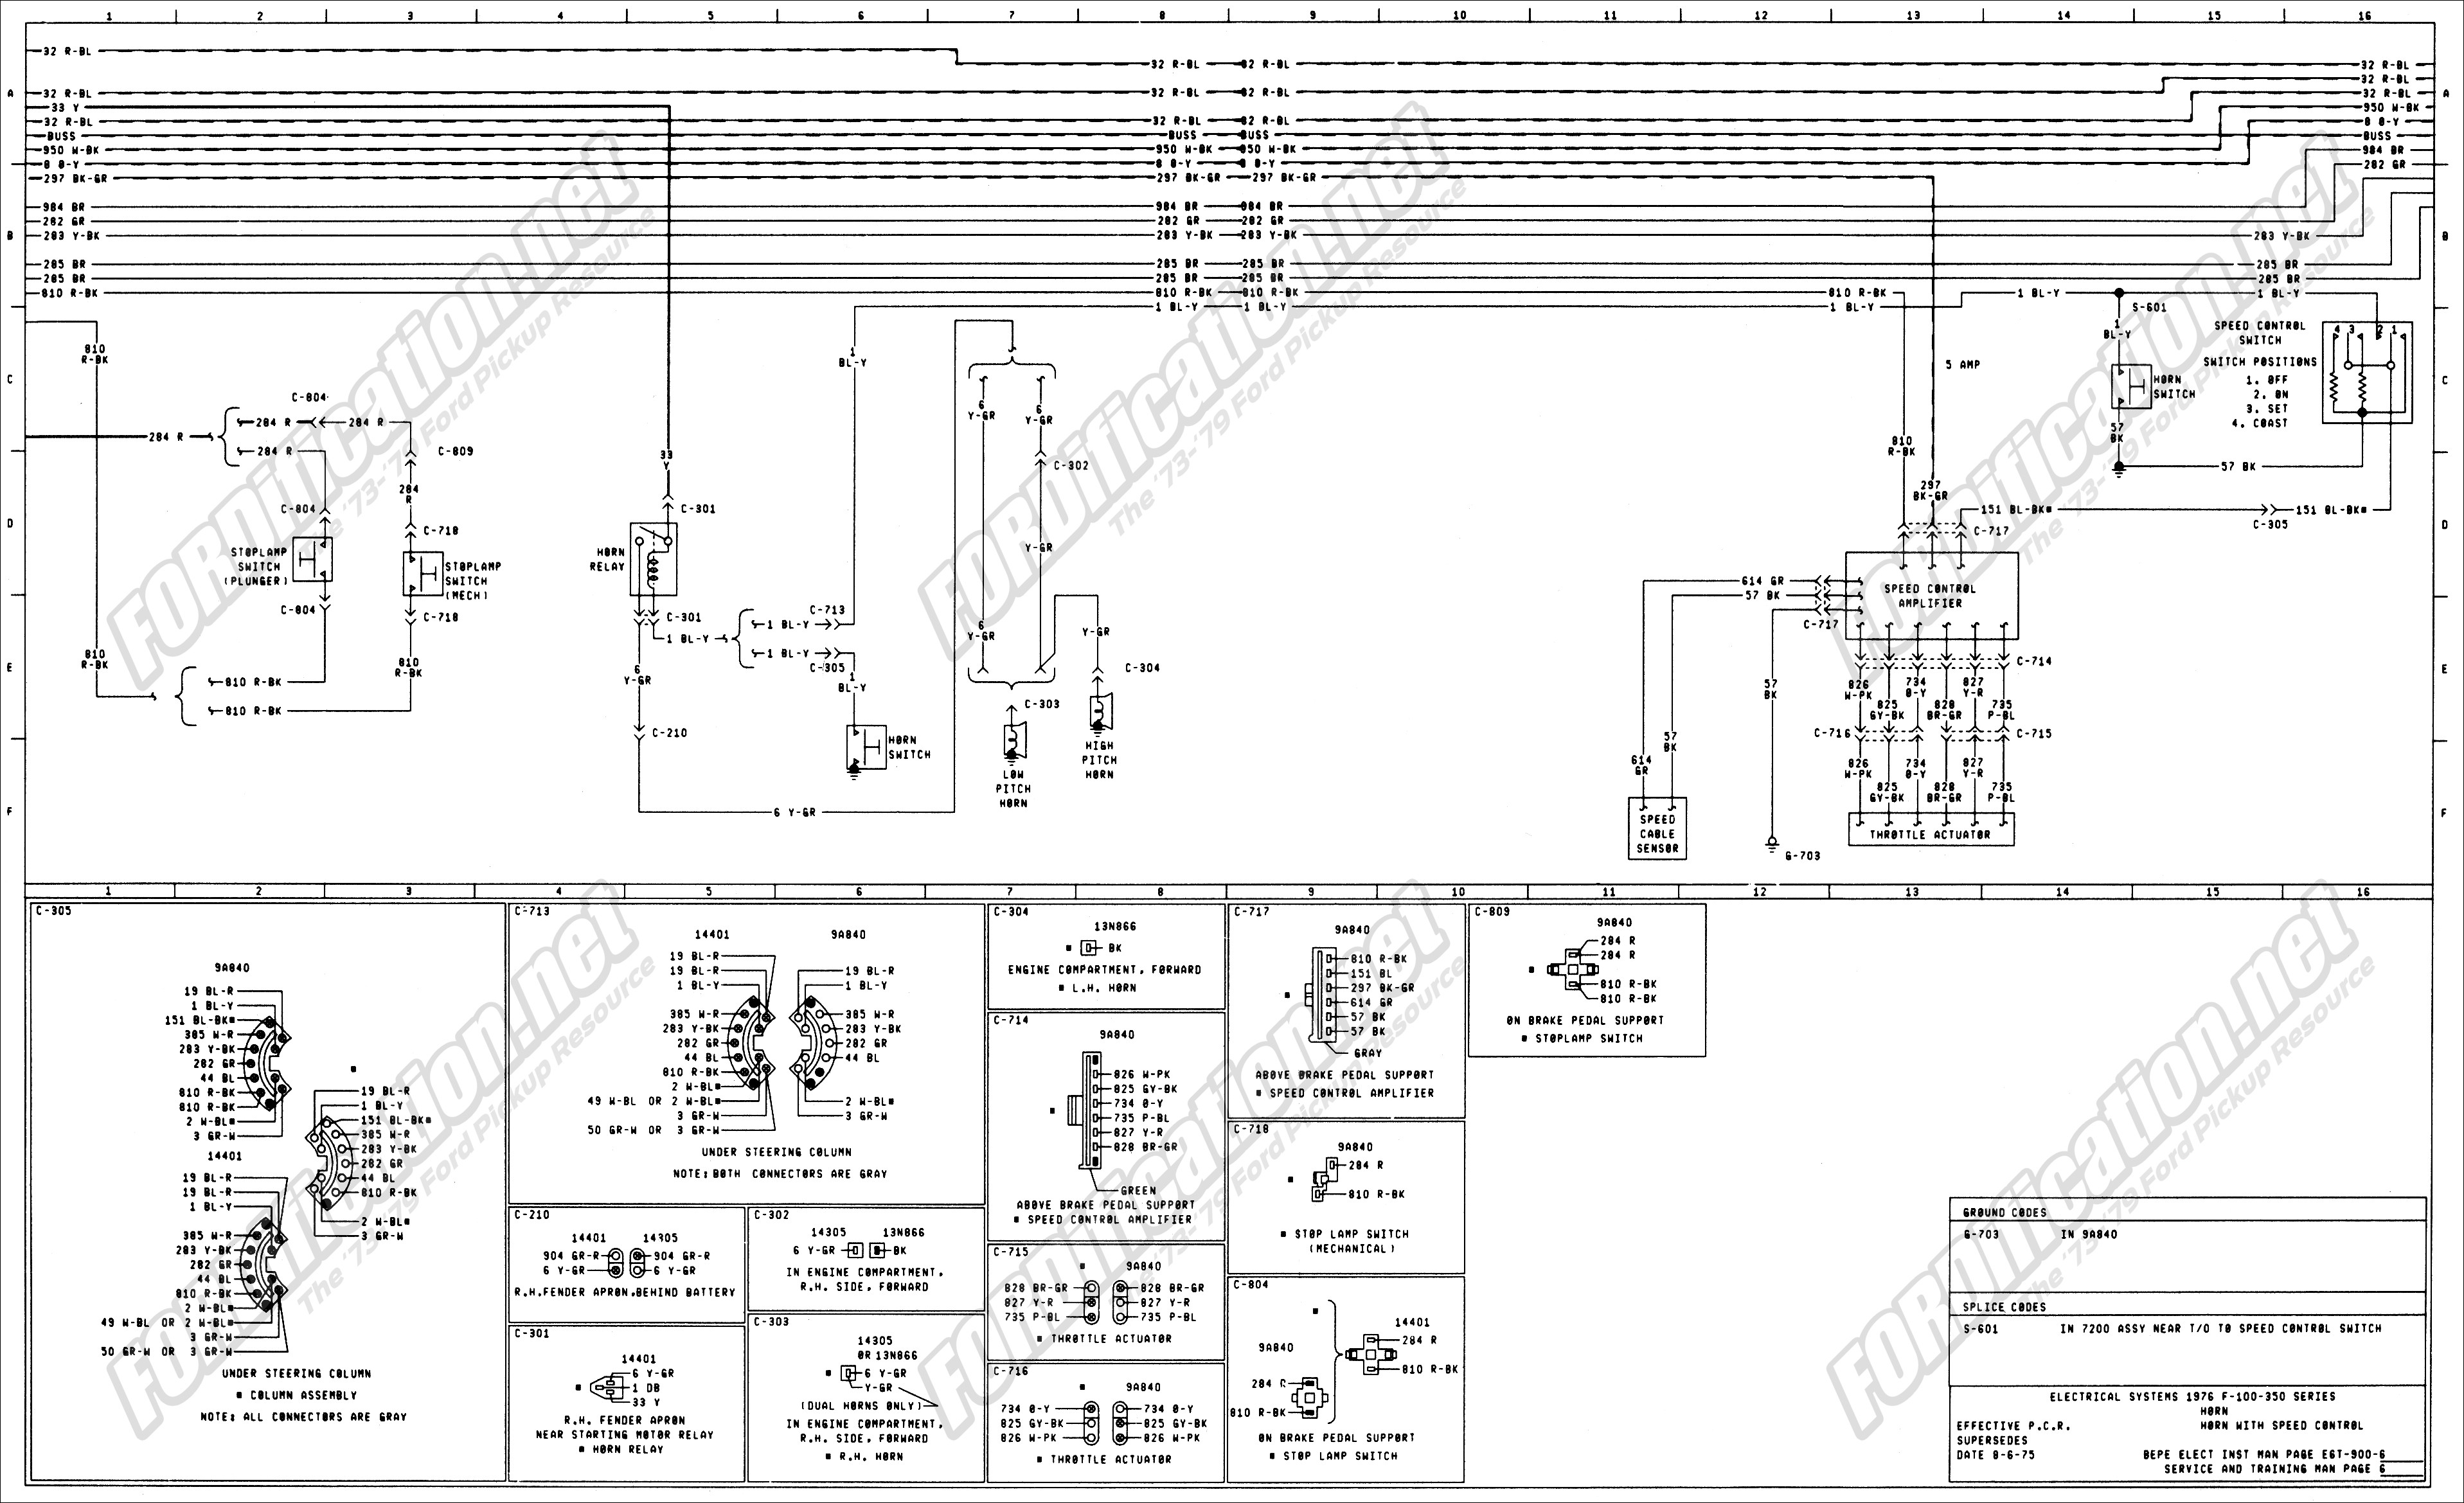 Turn Signal Wire Diagram 1973 1979 ford Truck Wiring Diagrams & Schematics fordification Of Turn Signal Wire Diagram